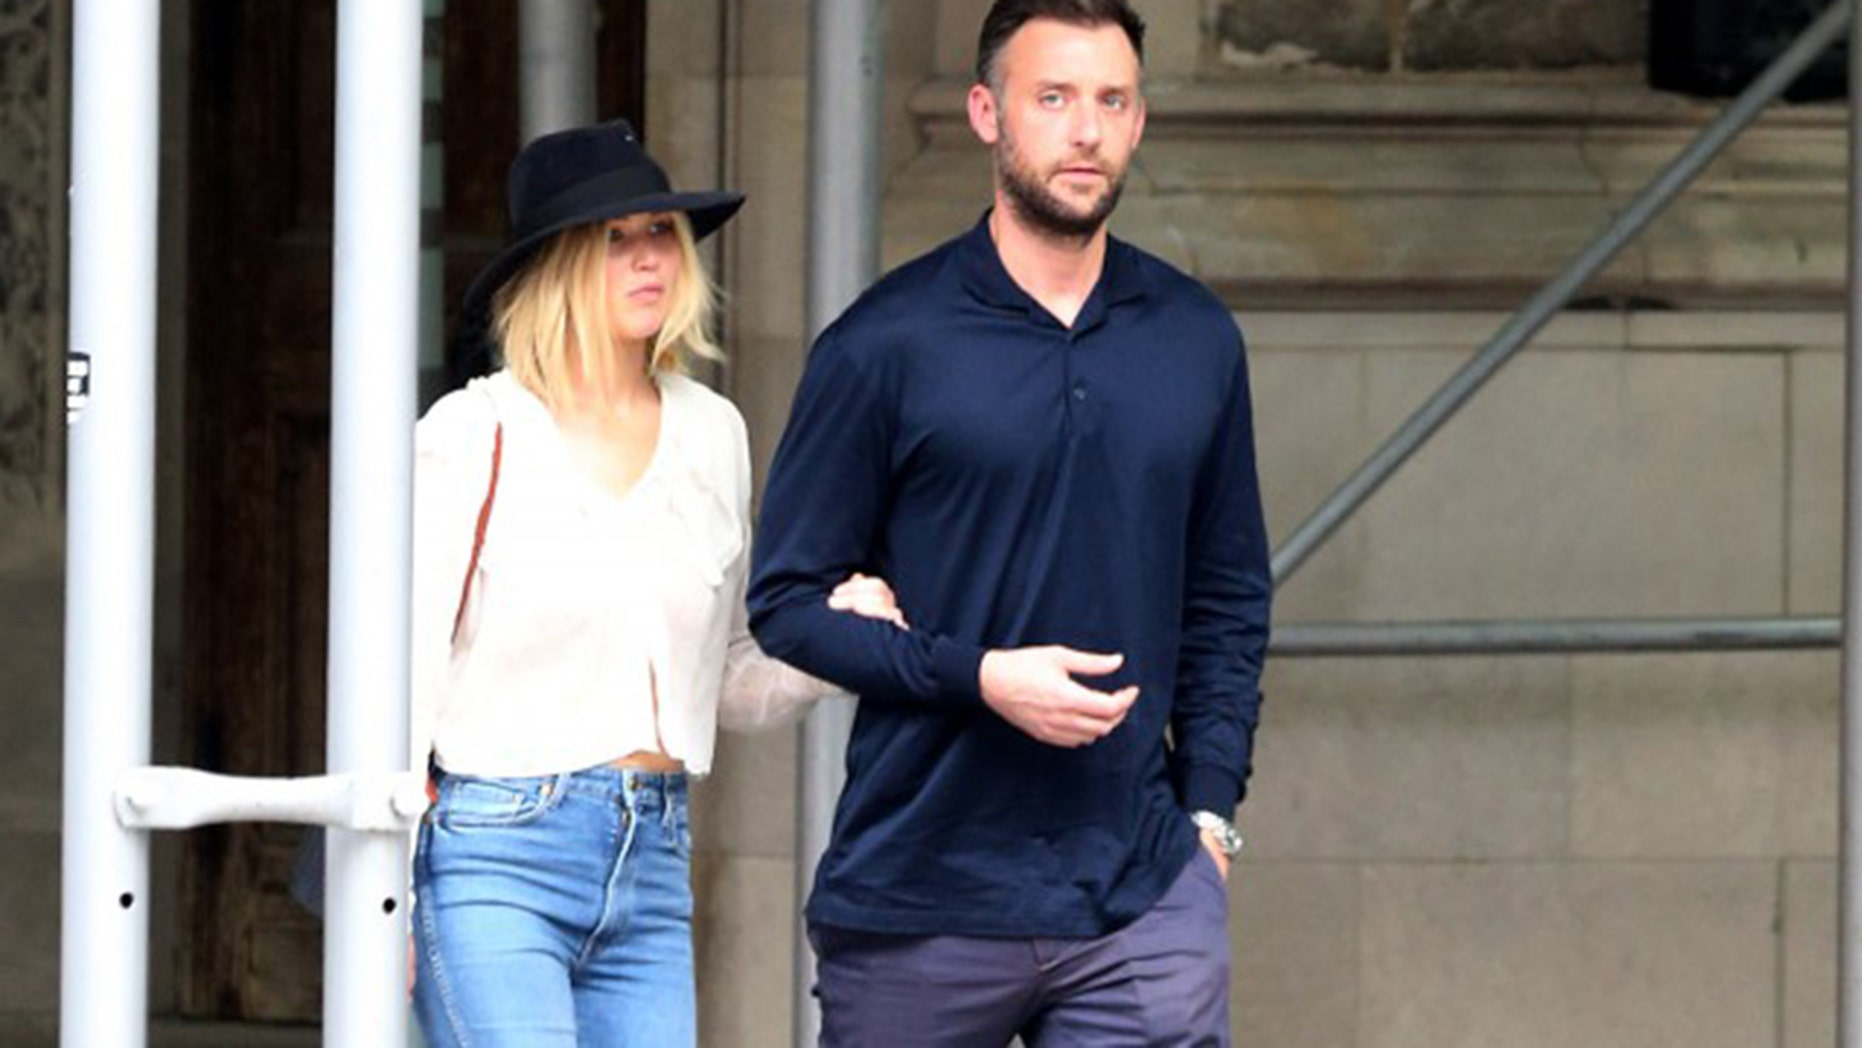 Jennifer Lawrence Goes Public With Rumored Boyfriend Cooke